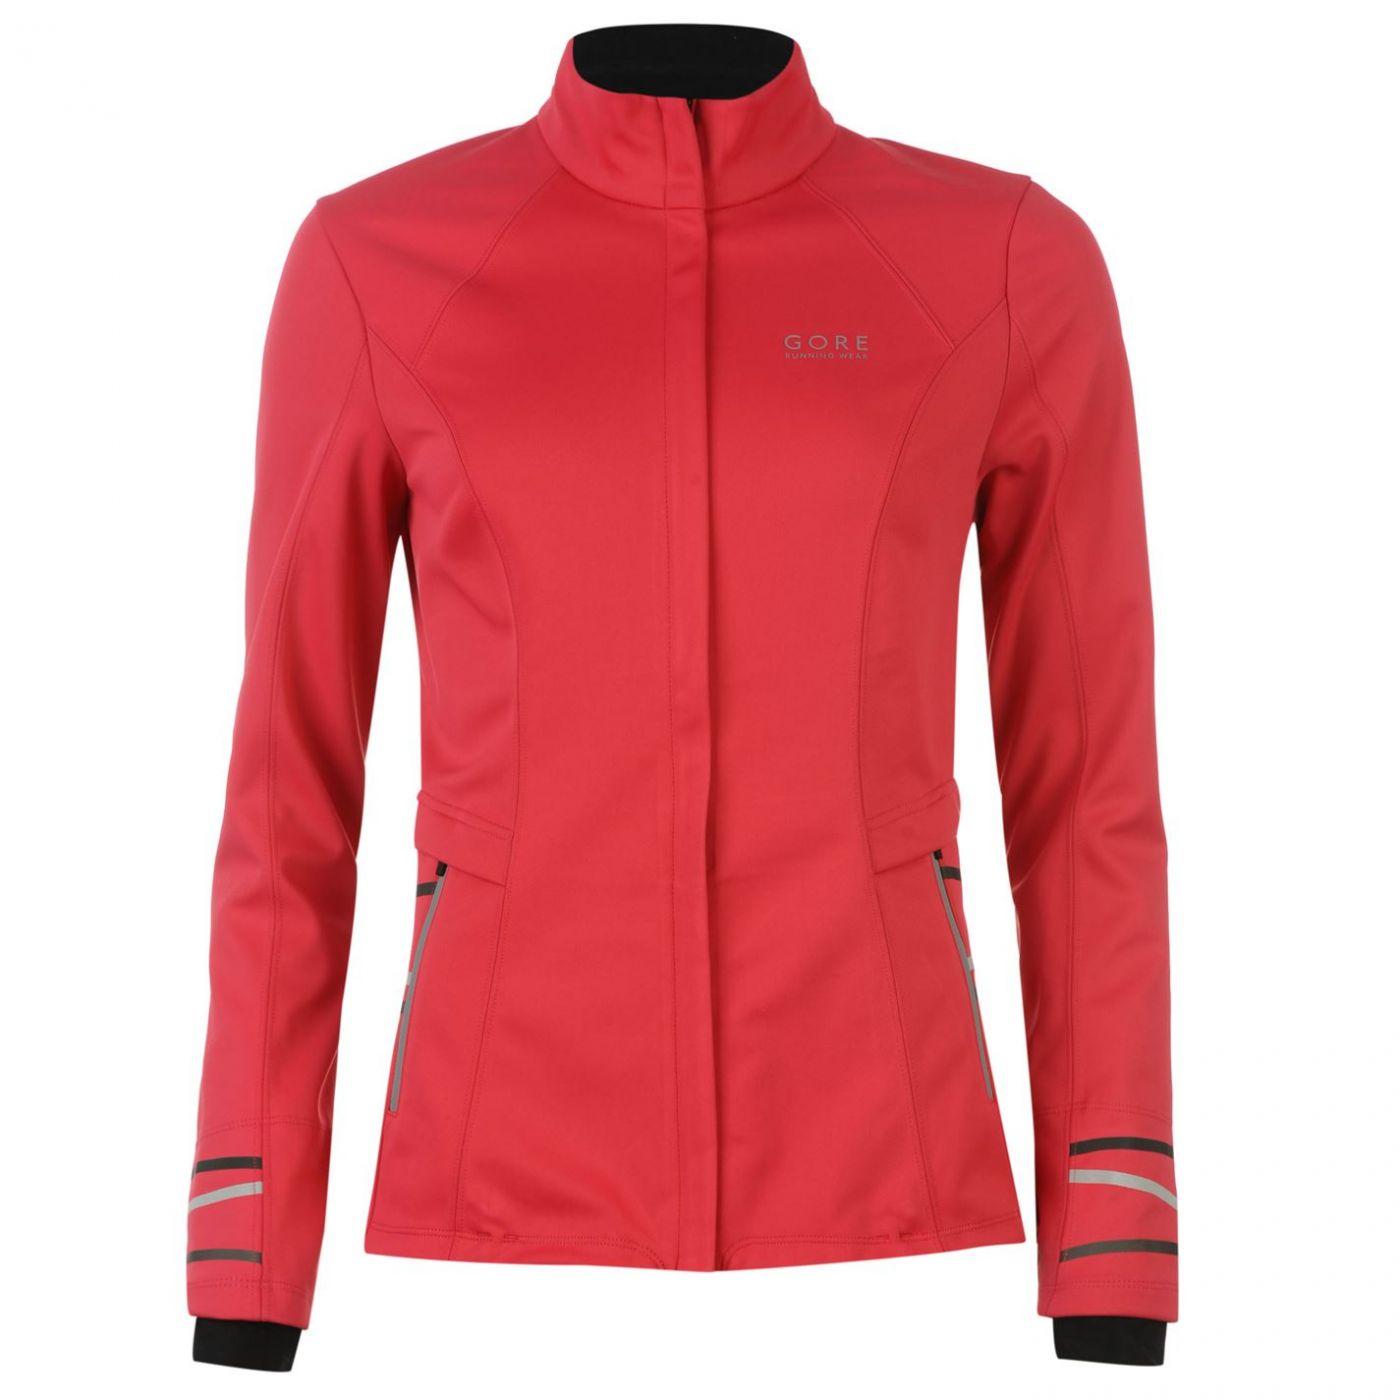 Gore Mythos Wind Stopper Jacket Womens